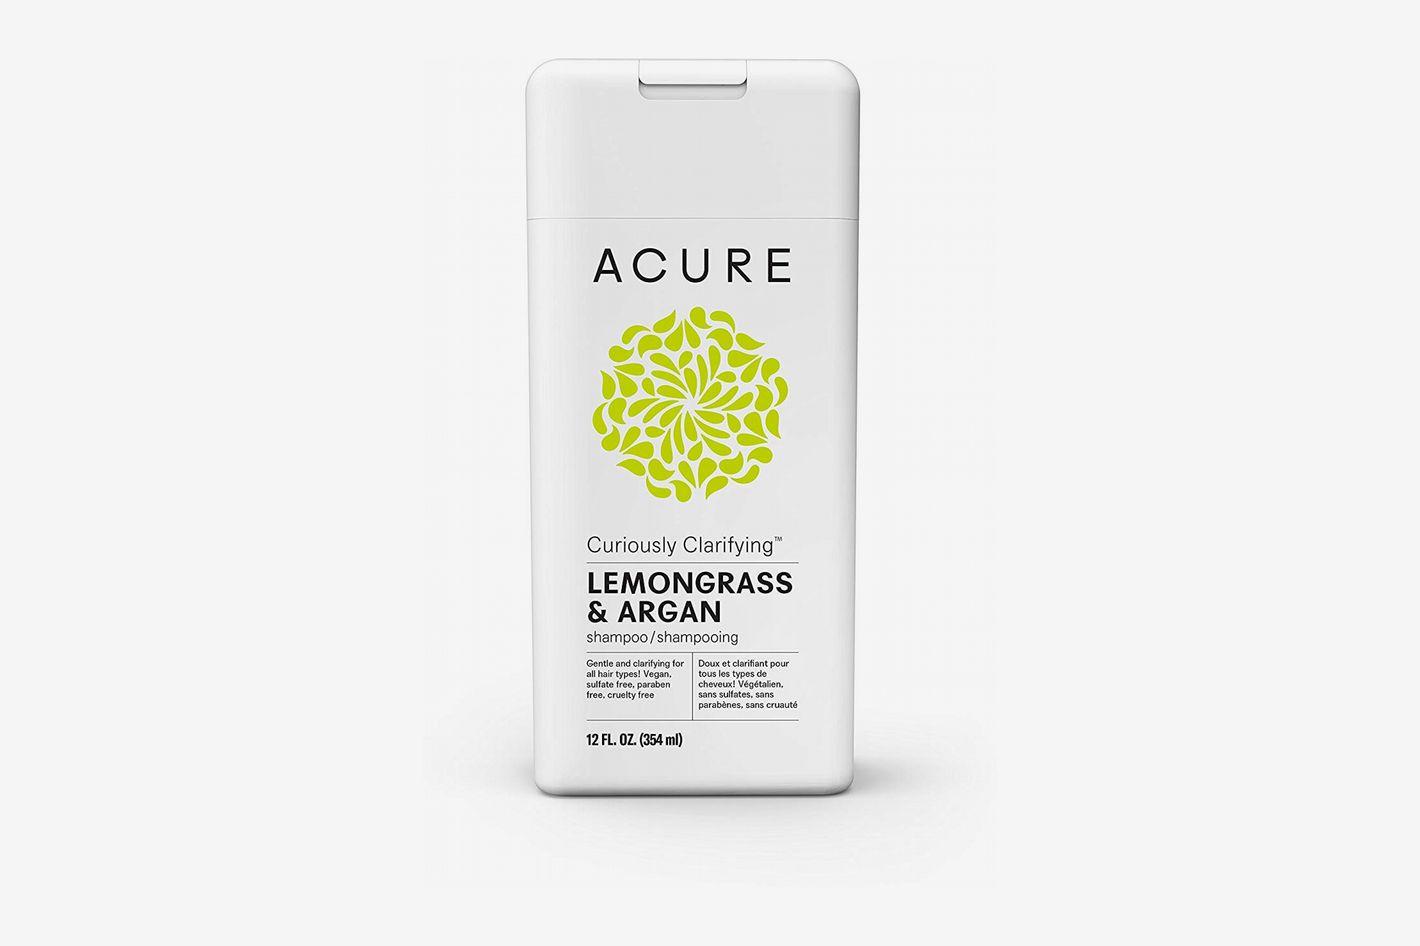 Acure Curiously Clarifying Lemongrass Shampoo